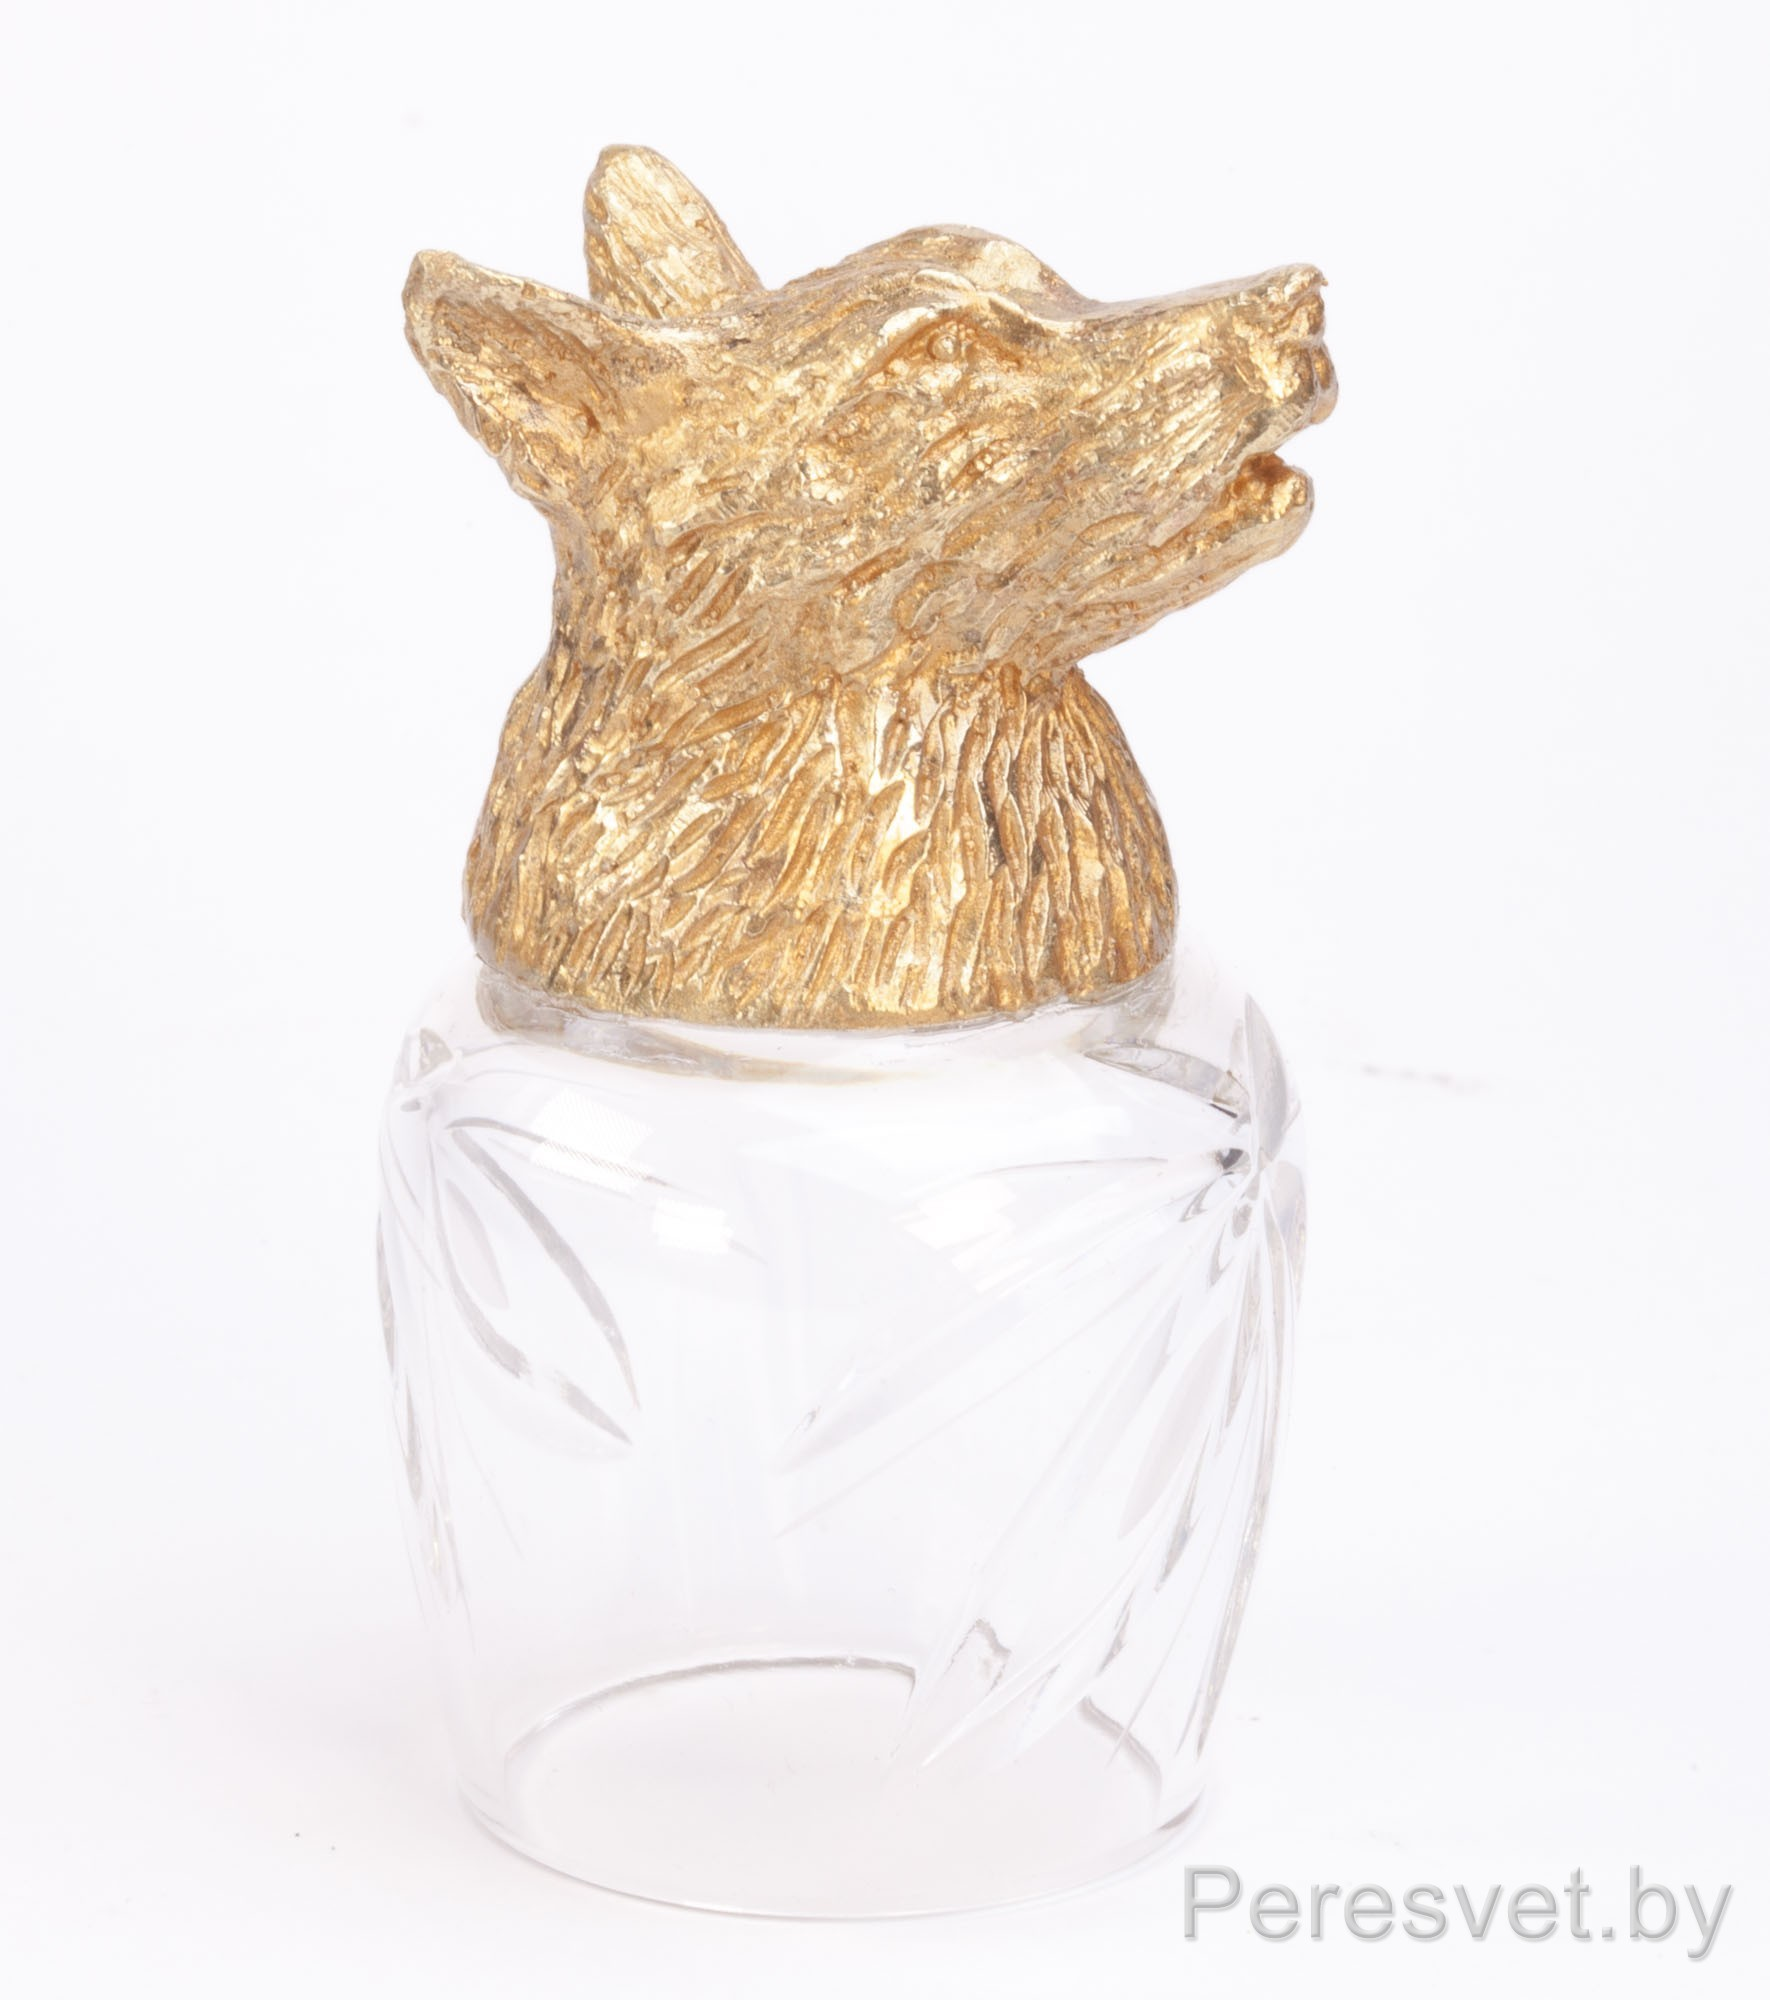 Рюмка перевертыш Охотничьи трофеи Волк hunting glasses Бронза(золото) на peresvet.by